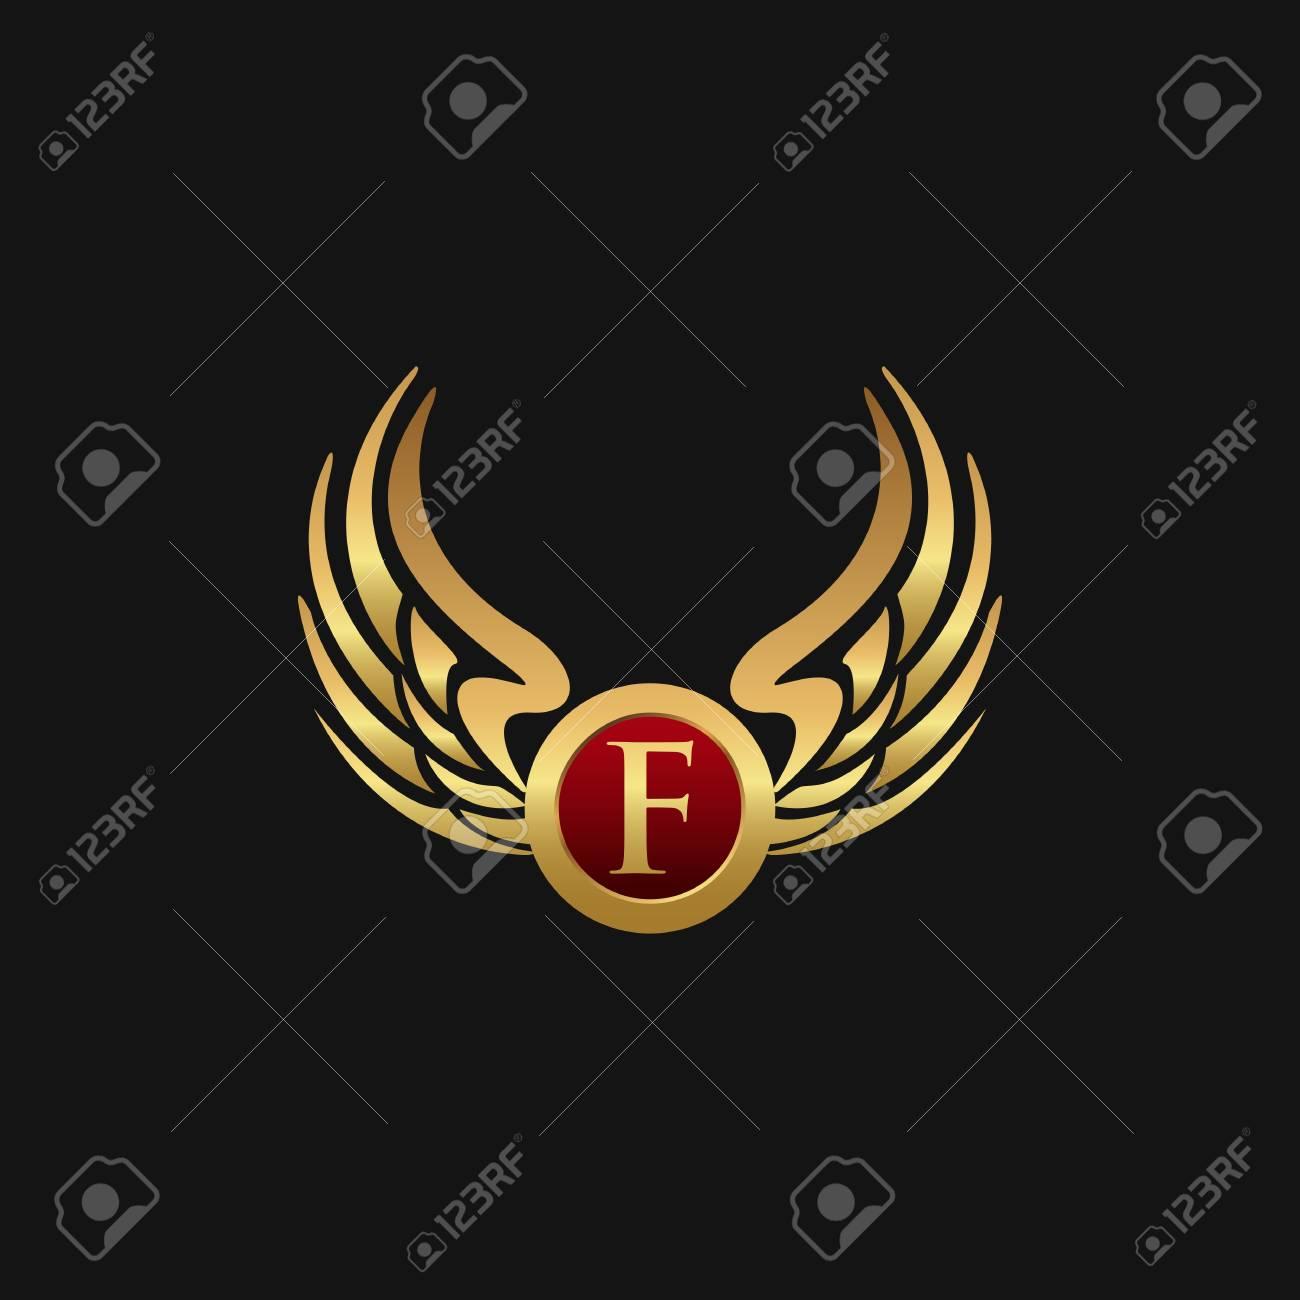 Luxury Letter F Emblem Wings logo design concept template - 87660391